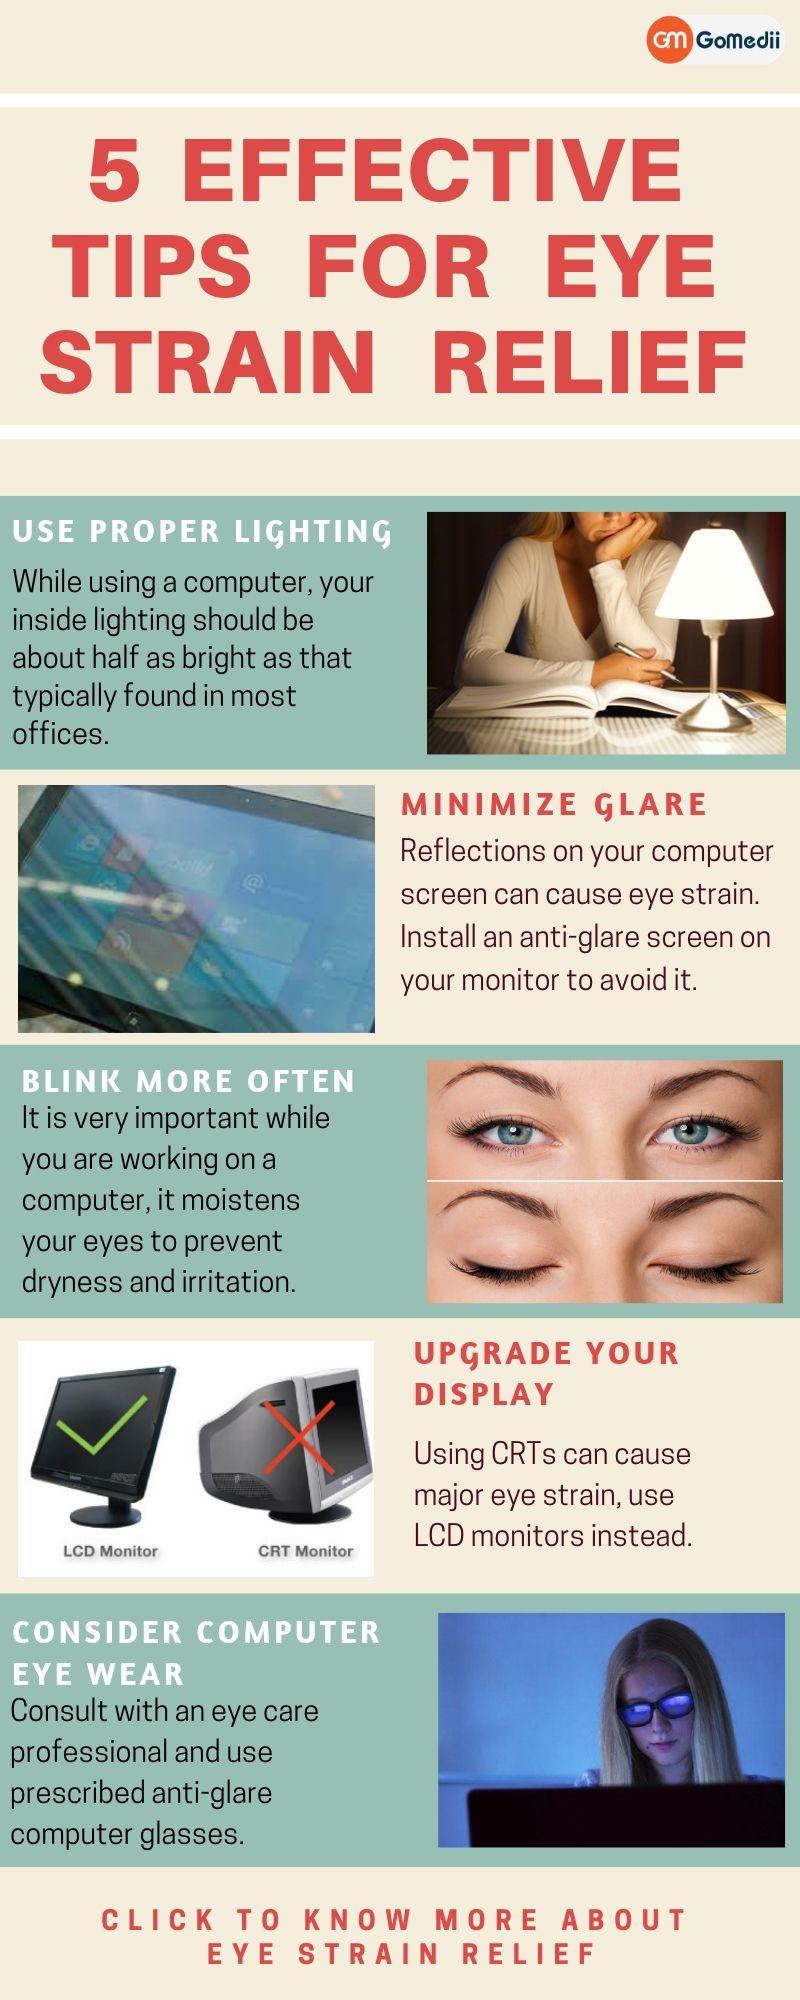 8e71a76166ebceebe6ef2b11127e90d7 - How To Get Rid Of Eye Strain Home Remedies